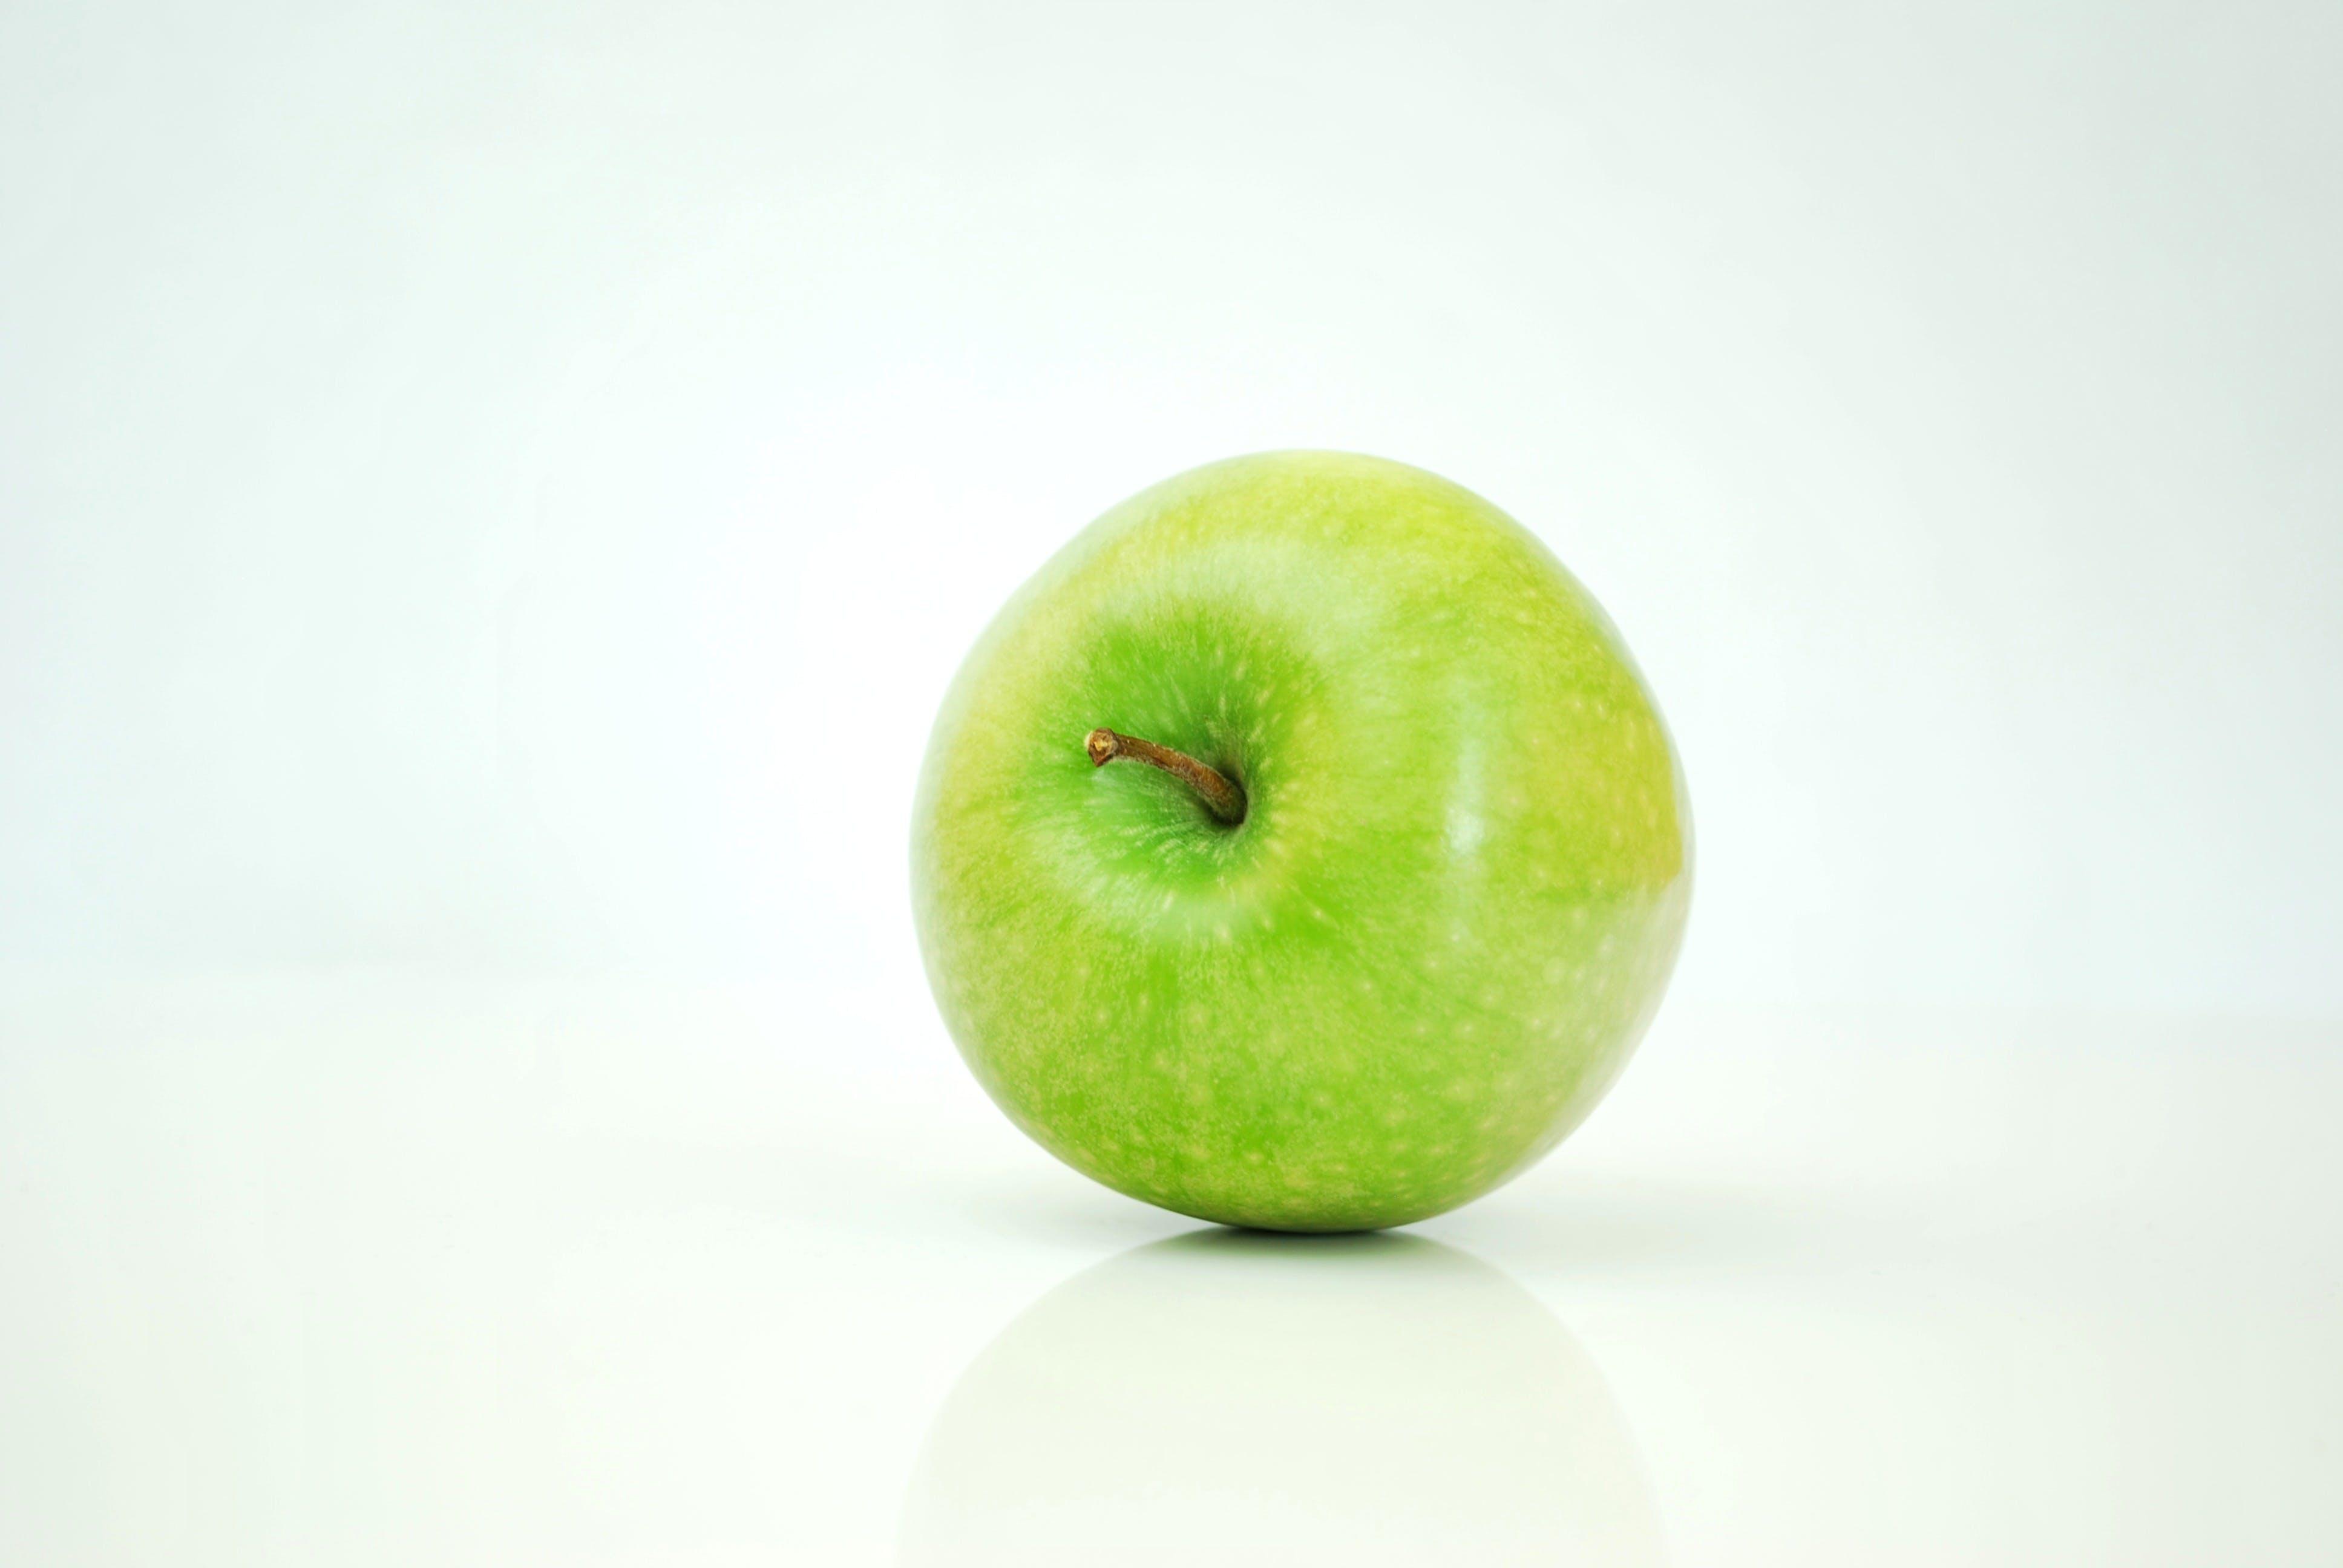 apfel, apple, essen